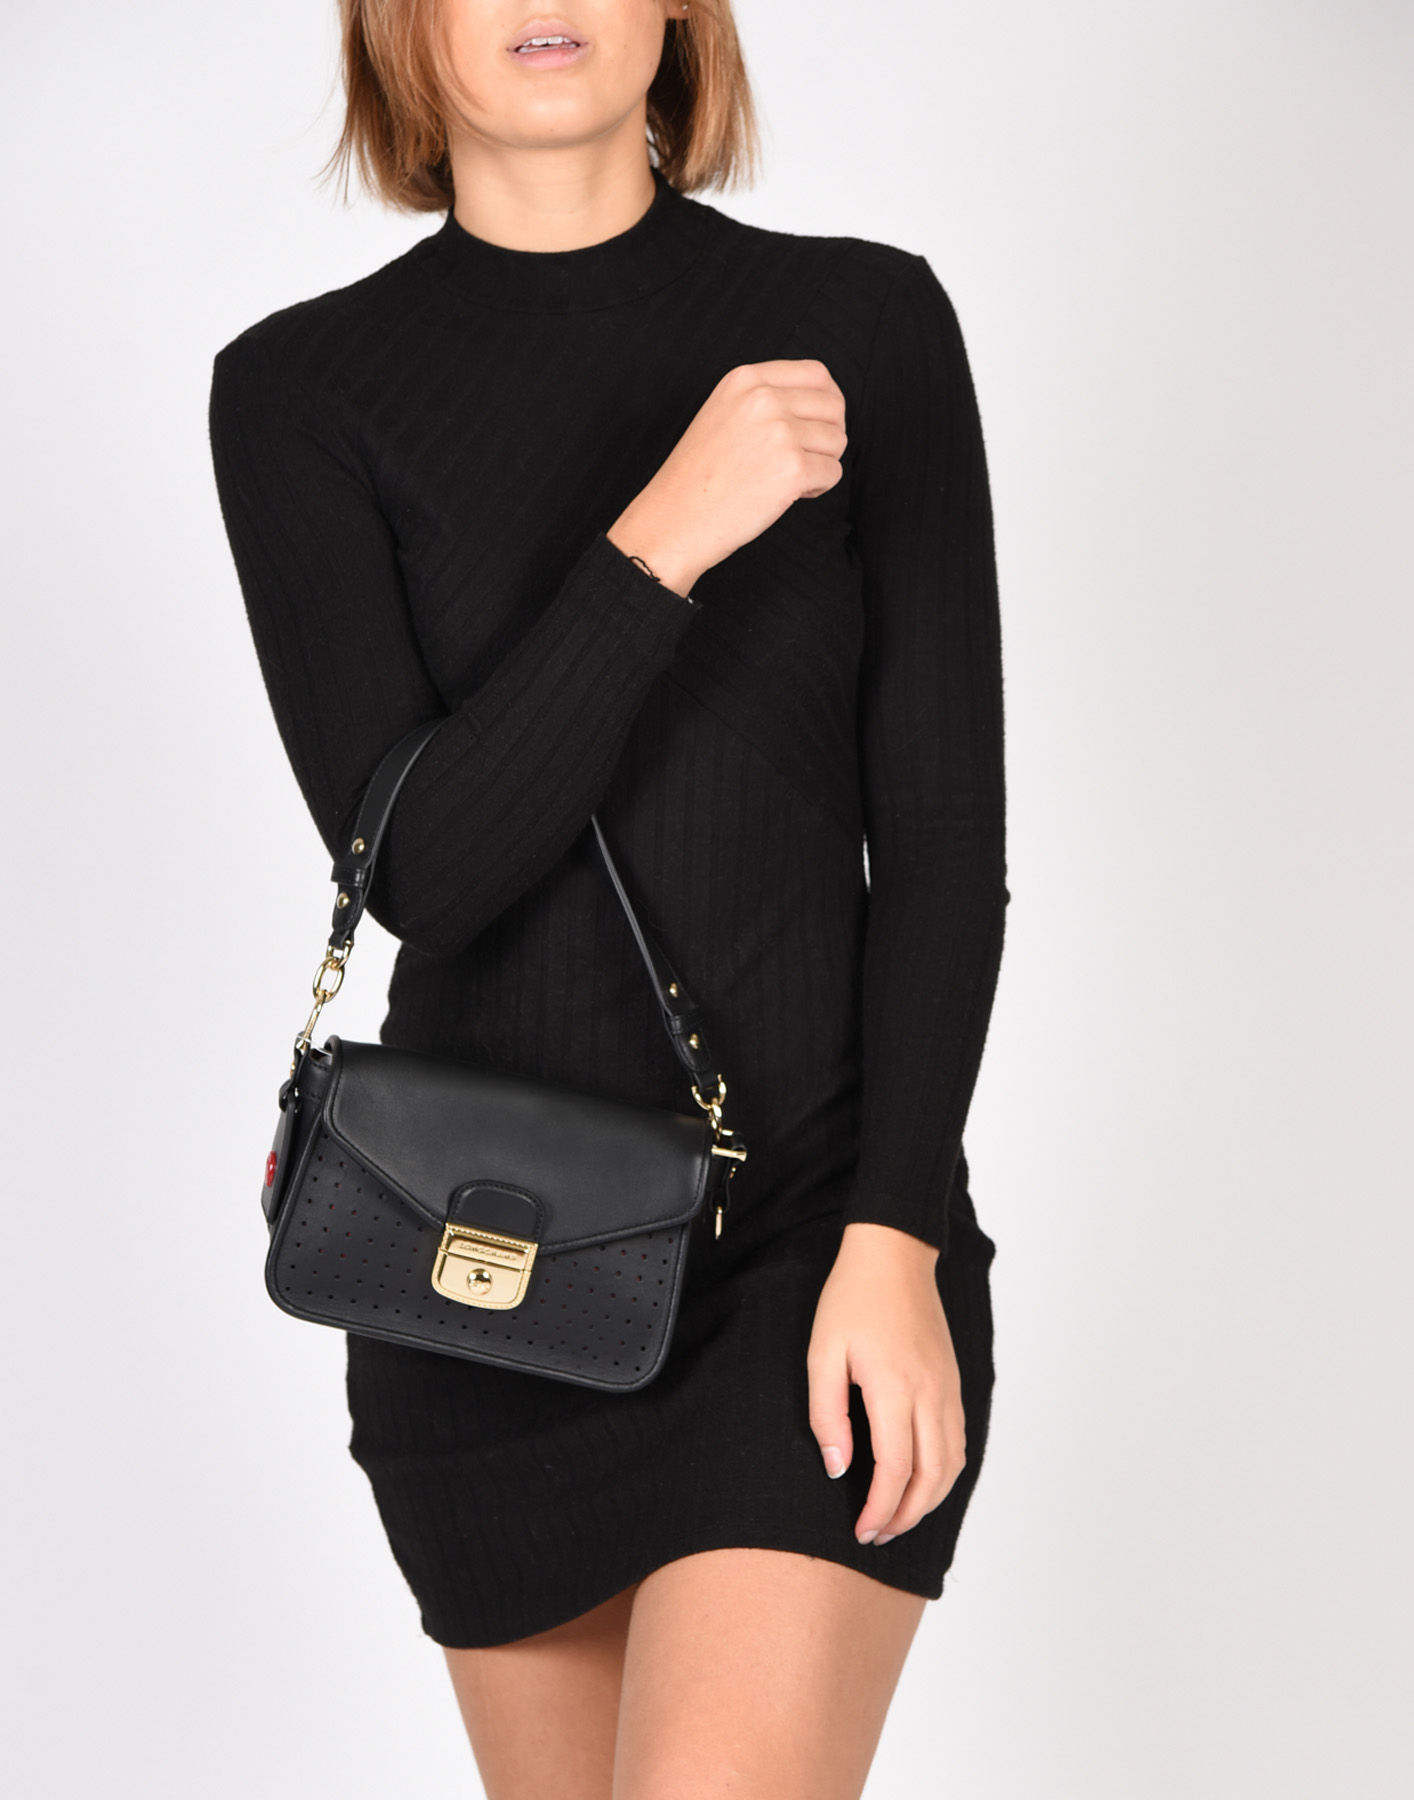 Shoulder bag Mademoiselle longchamp LONGCHAMP